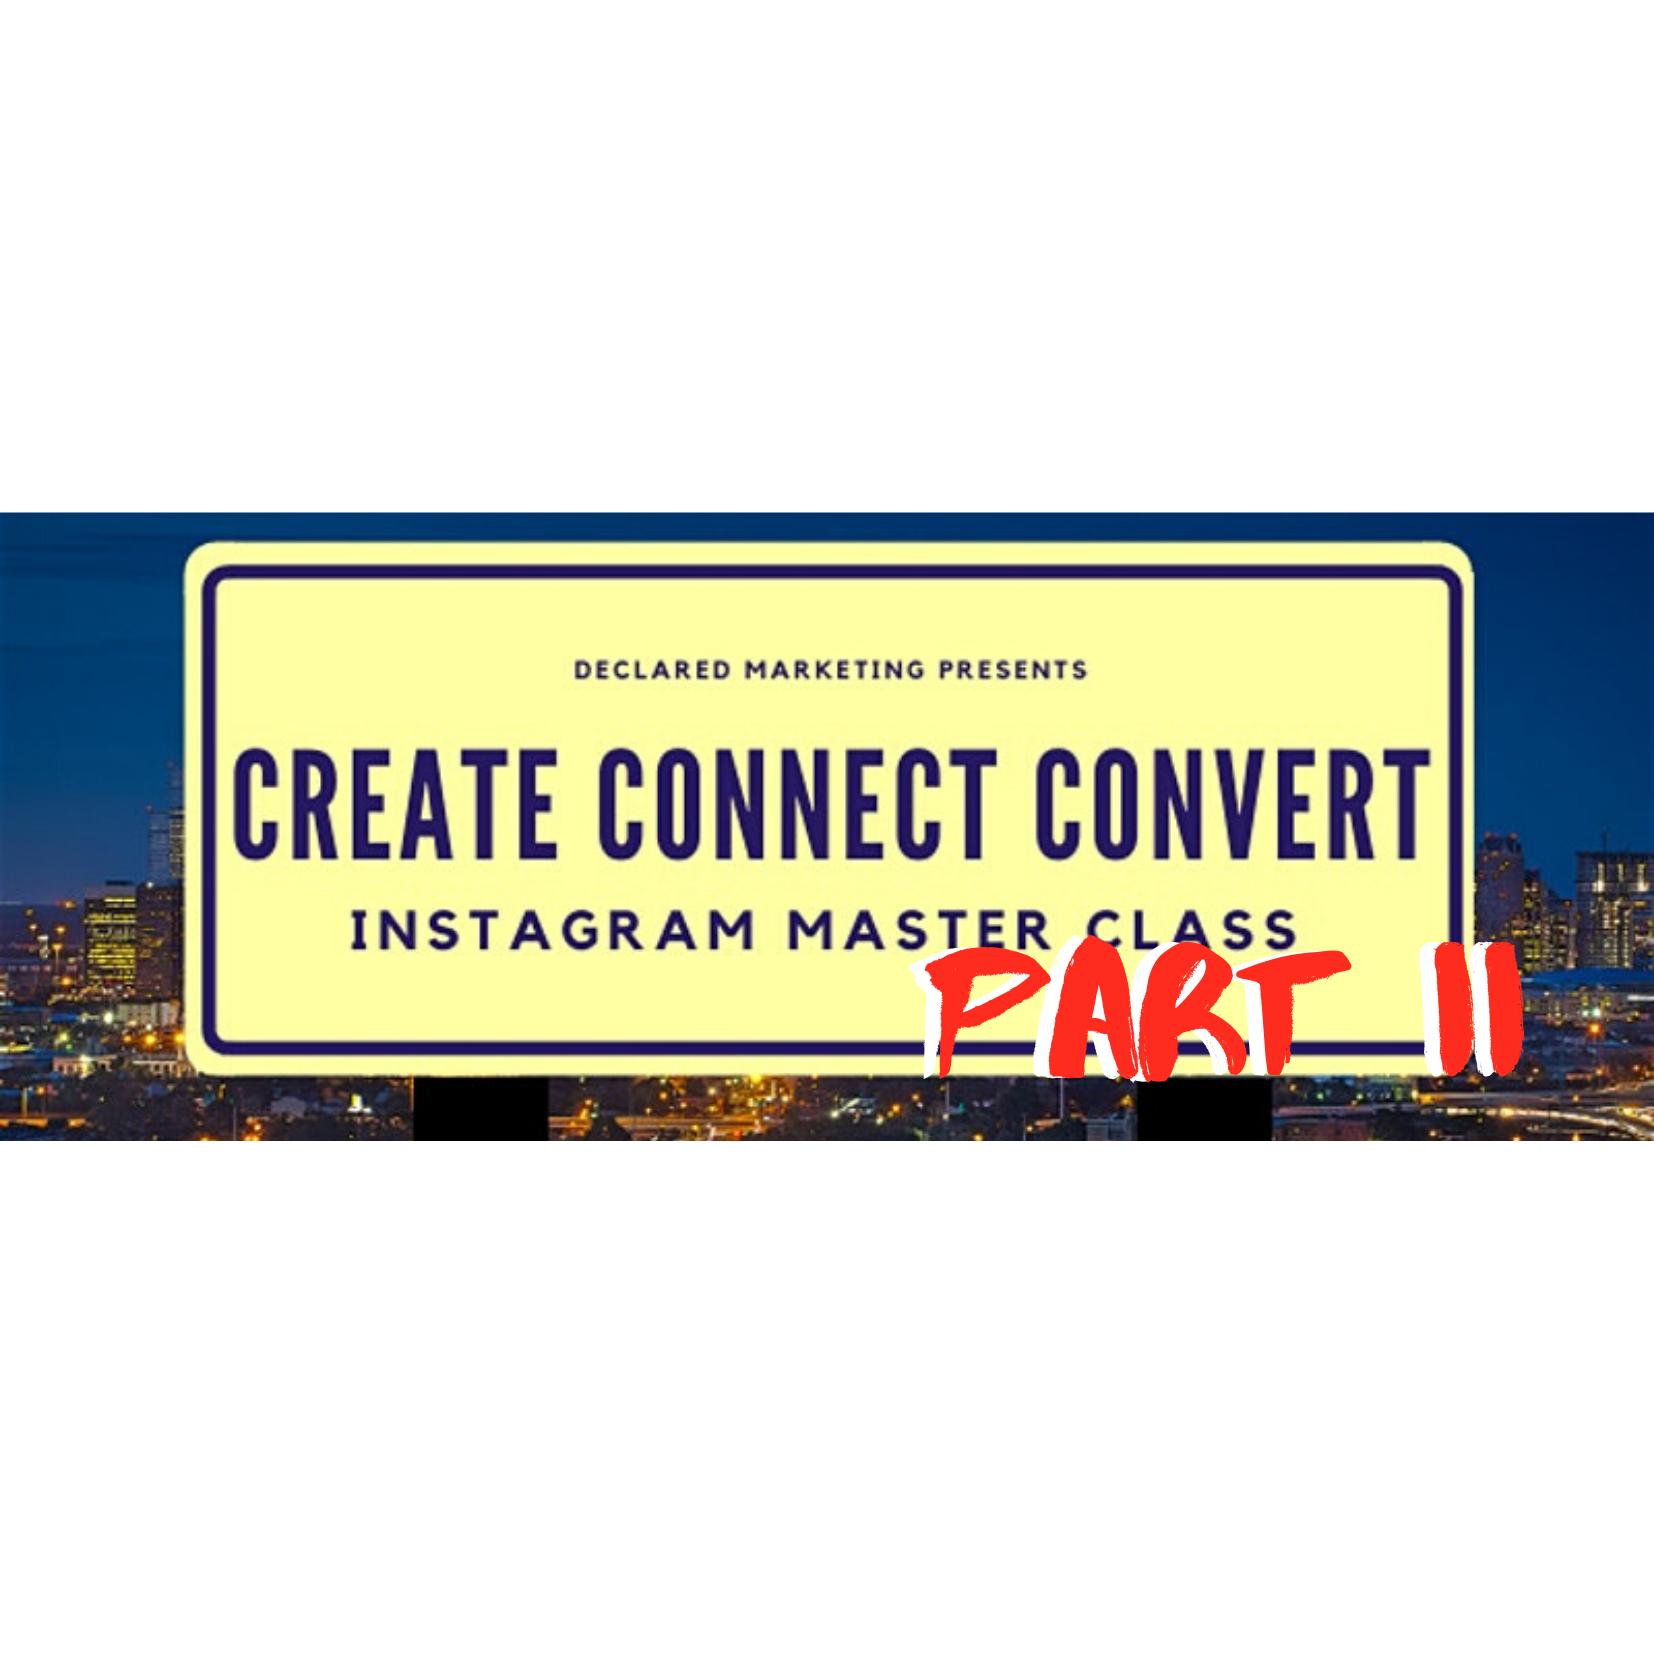 Connect Convert Instagram Masterclass